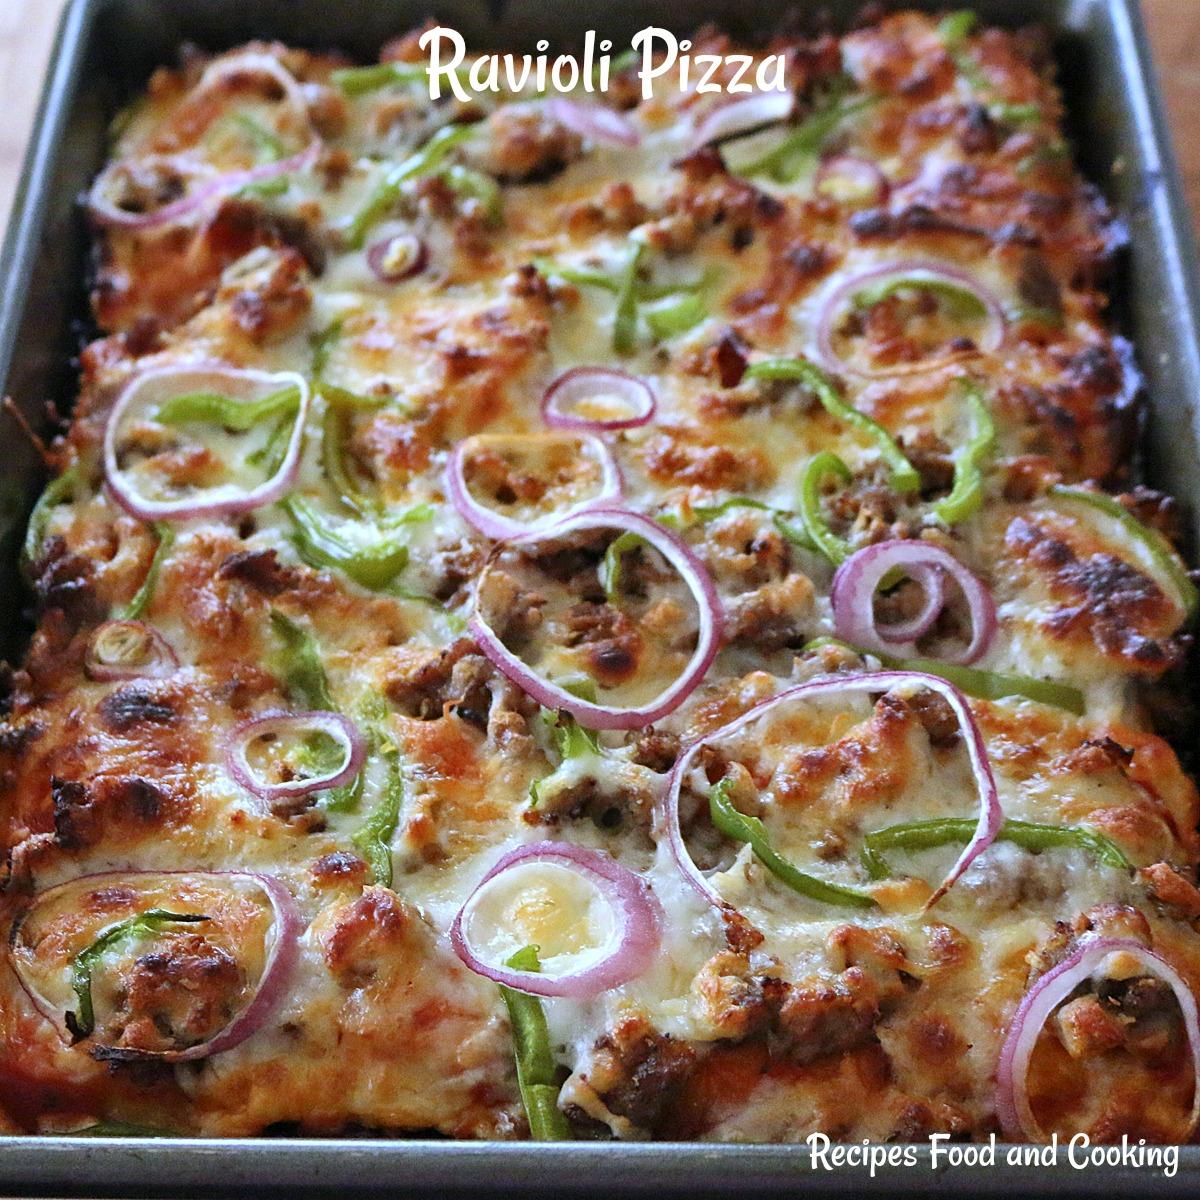 Ravioli Pizza